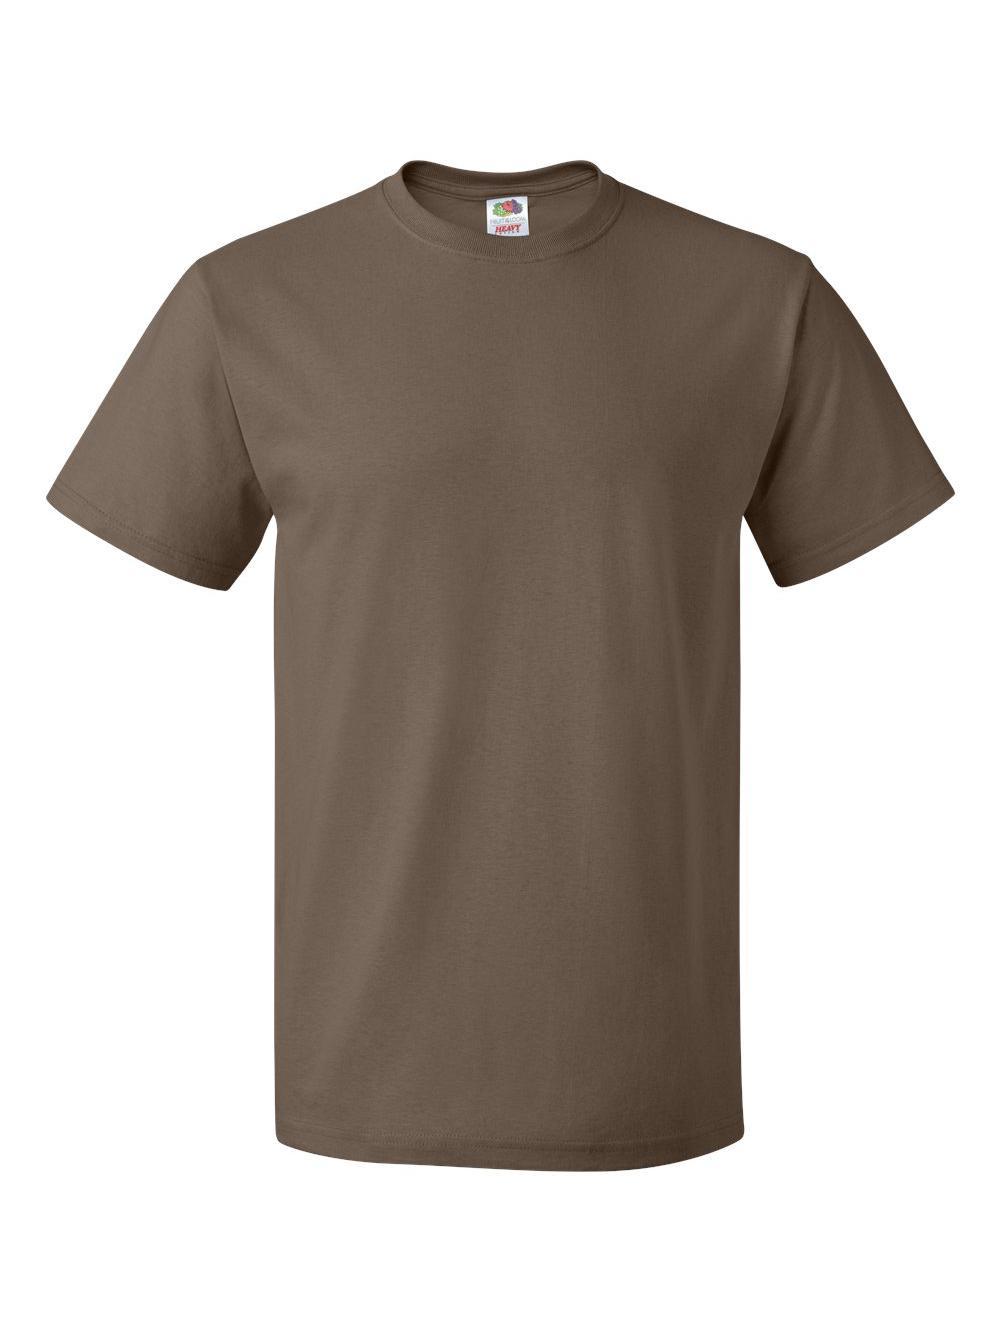 Fruit-of-the-Loom-HD-Cotton-Short-Sleeve-T-Shirt-3930R thumbnail 27